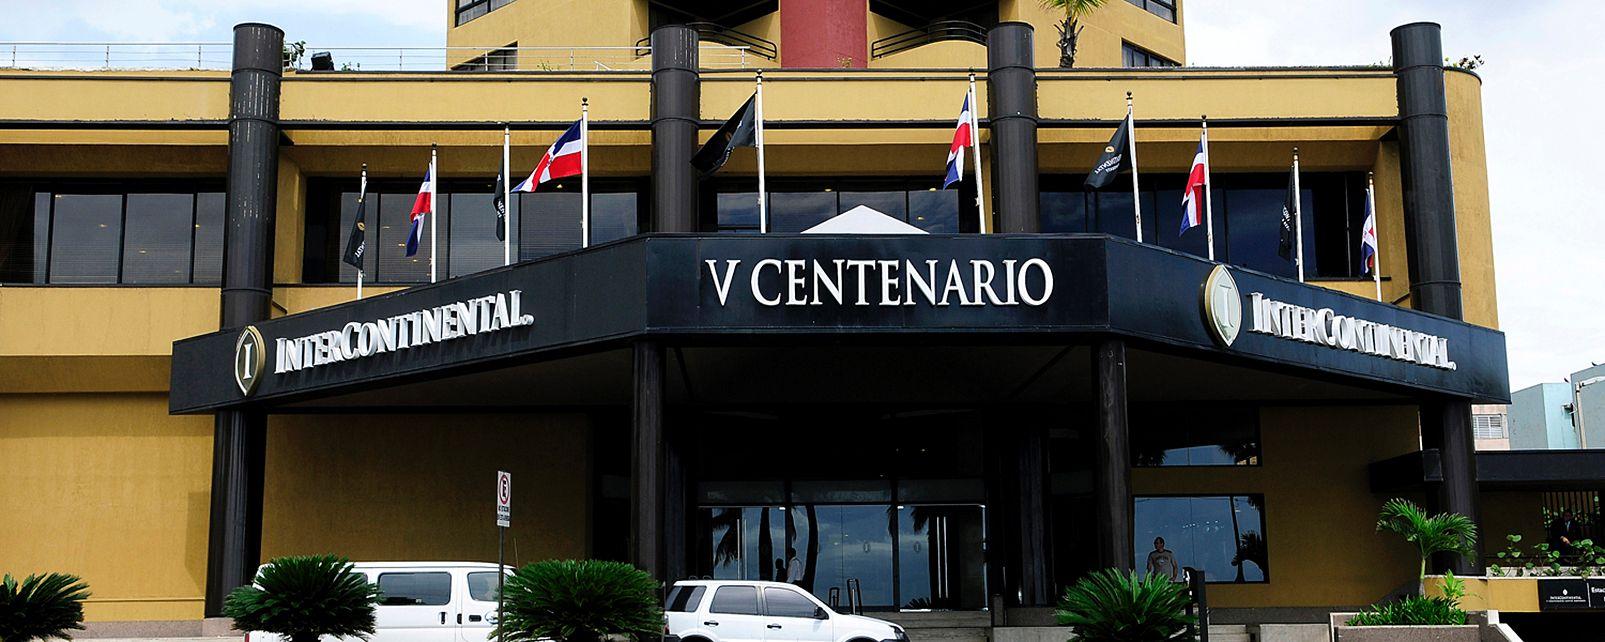 Hôtel Crowne Plaza V Centenario Santo Domingo